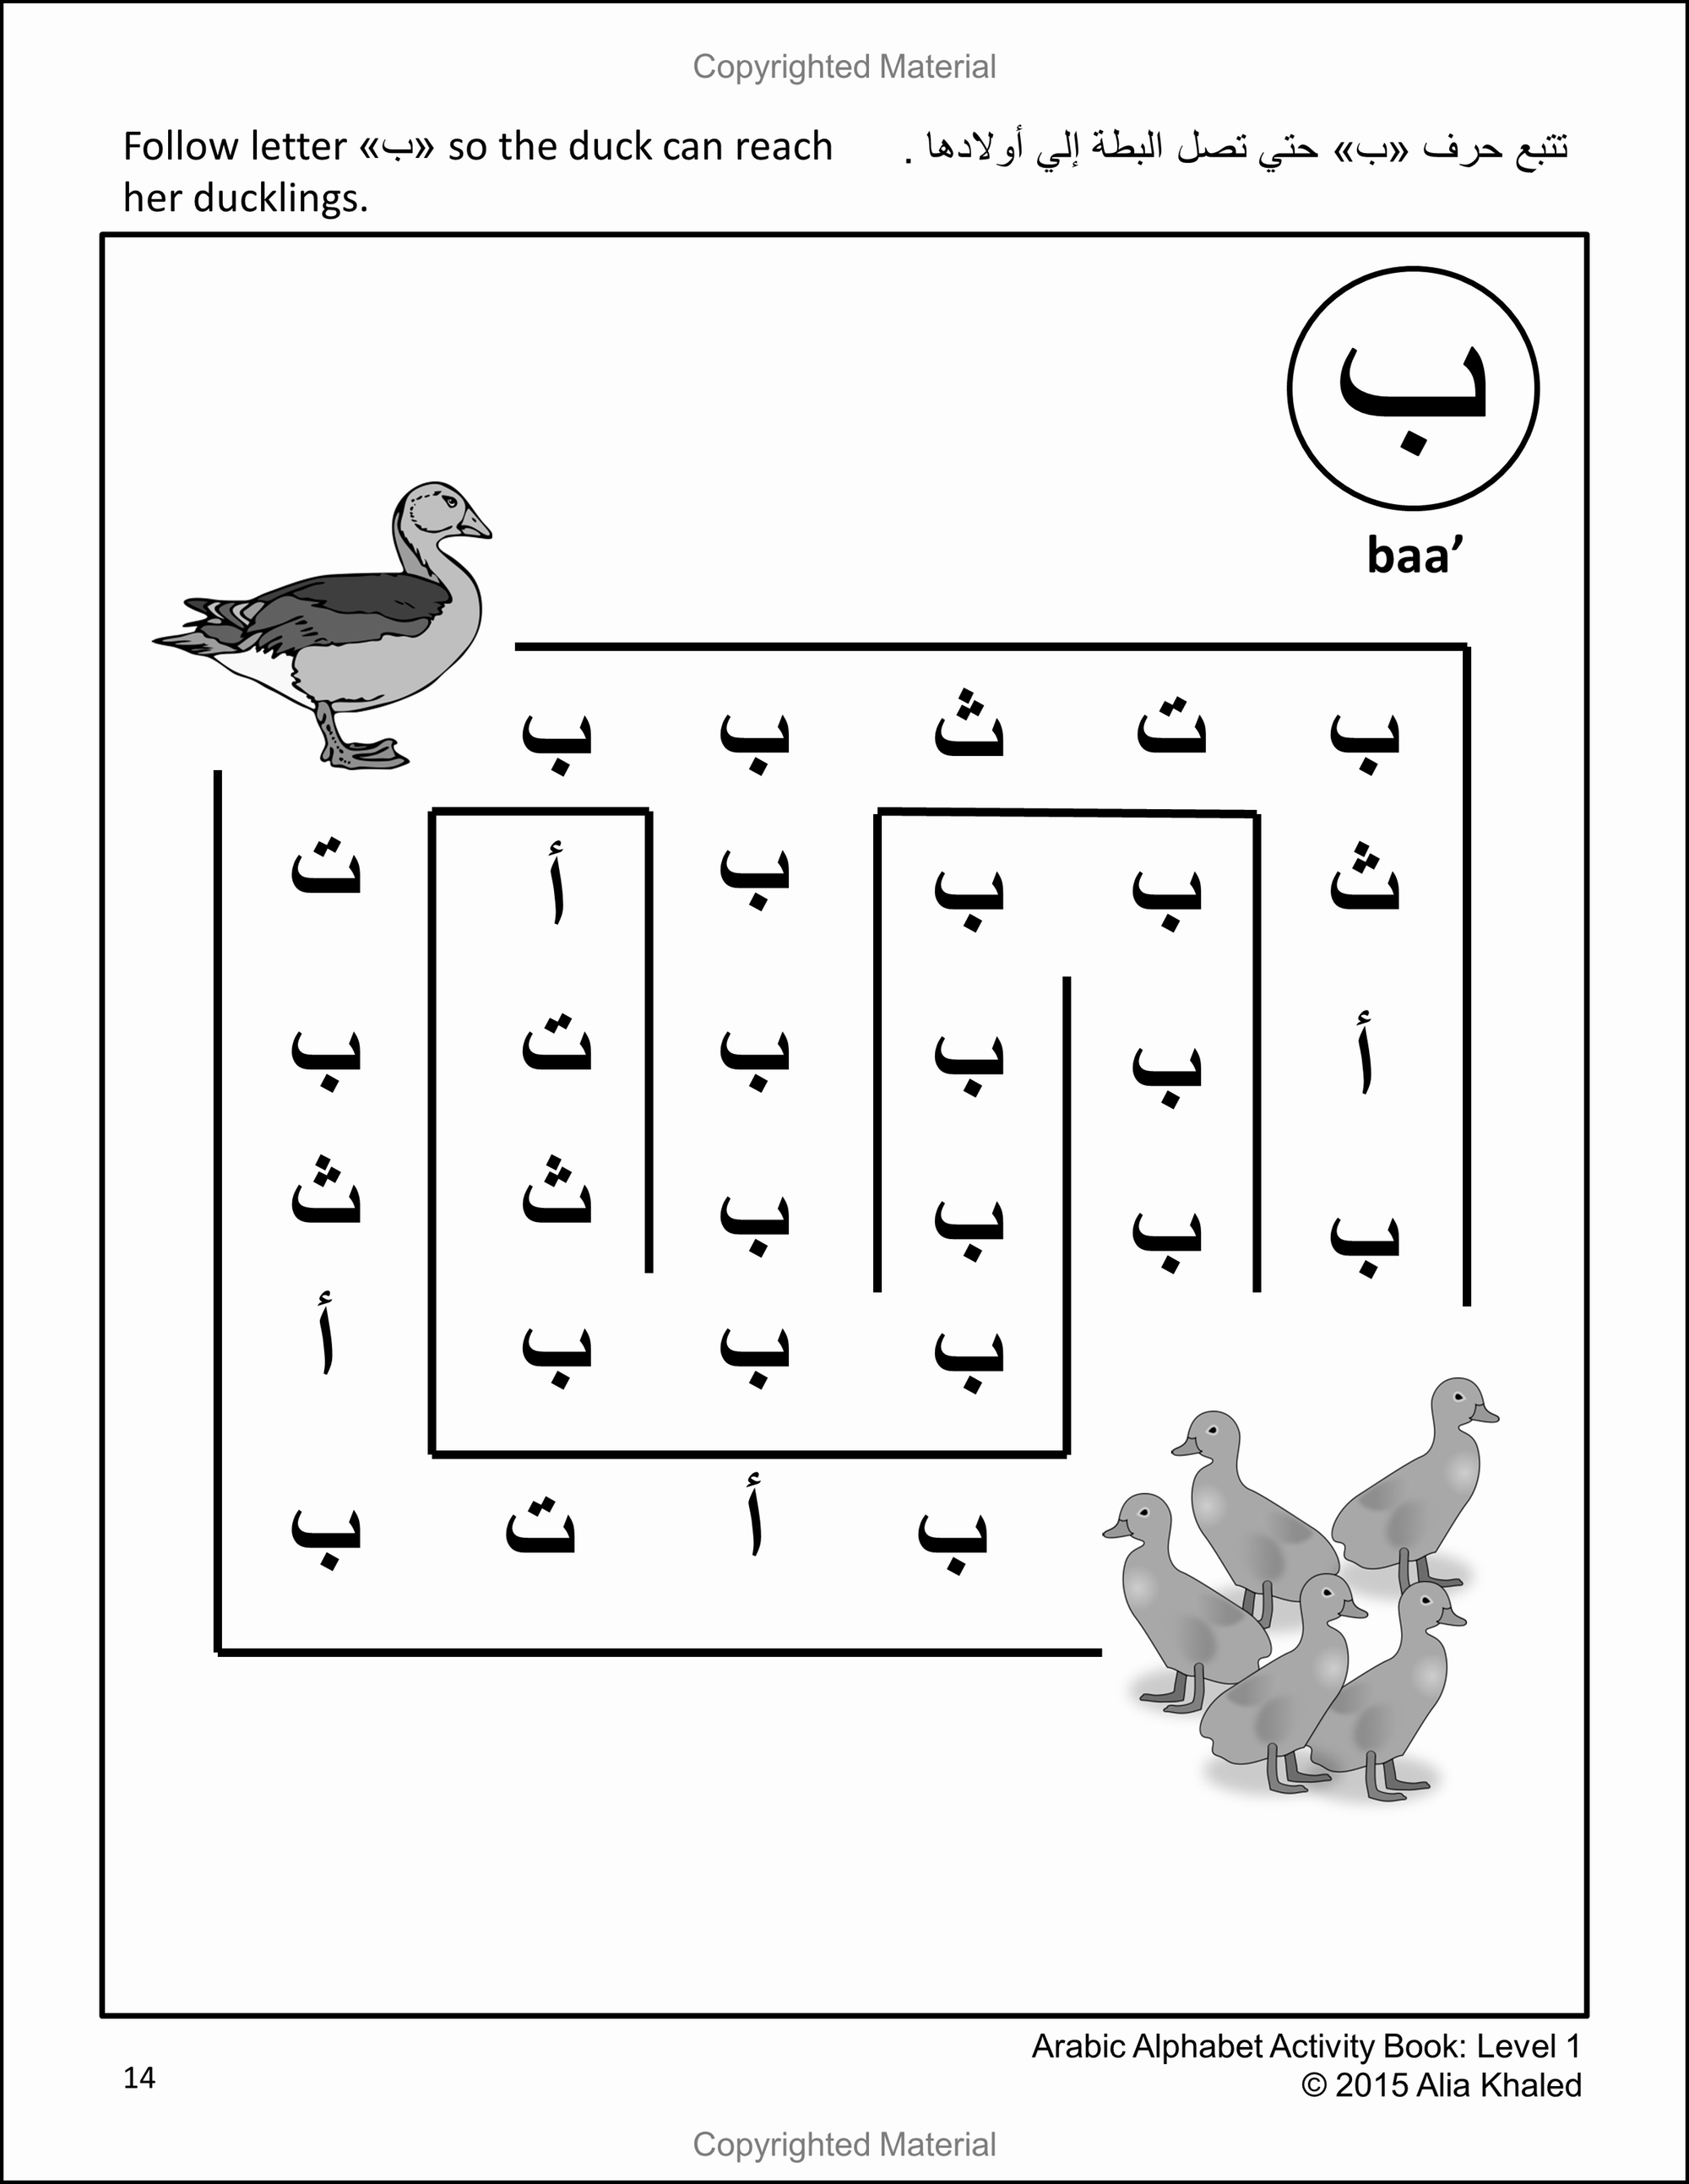 image of arabic alphabet activity book level 1 black white edition arabic alphabet. Black Bedroom Furniture Sets. Home Design Ideas